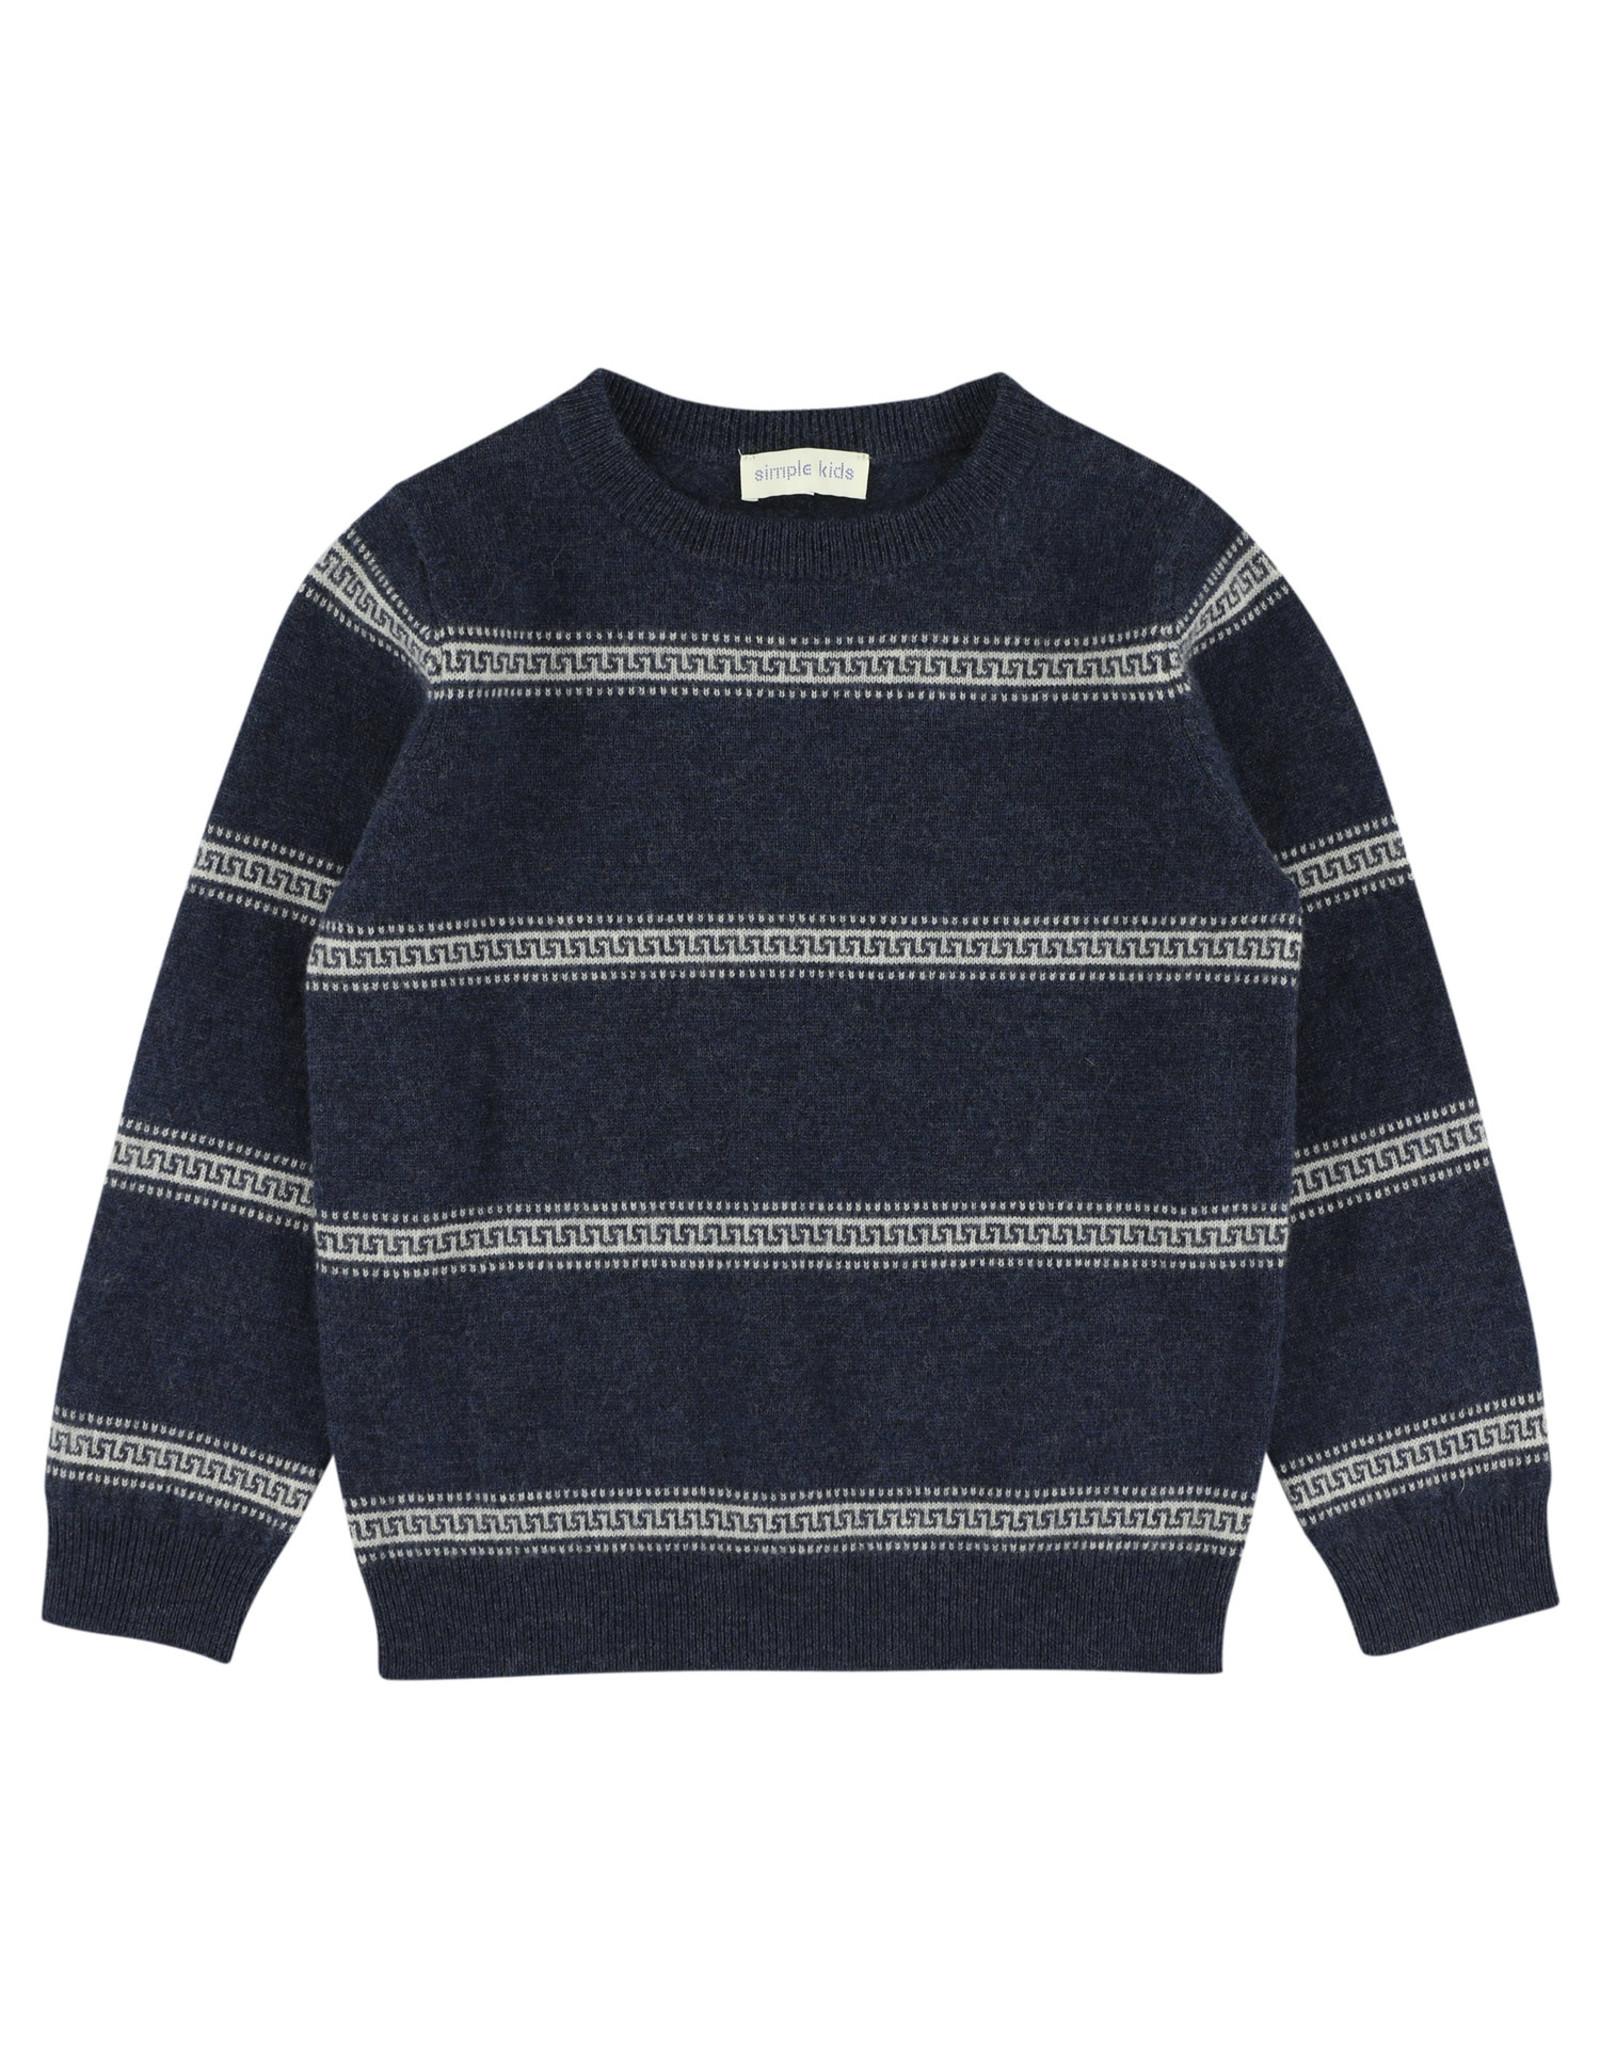 Simple Kids Carne Orla blue pullover